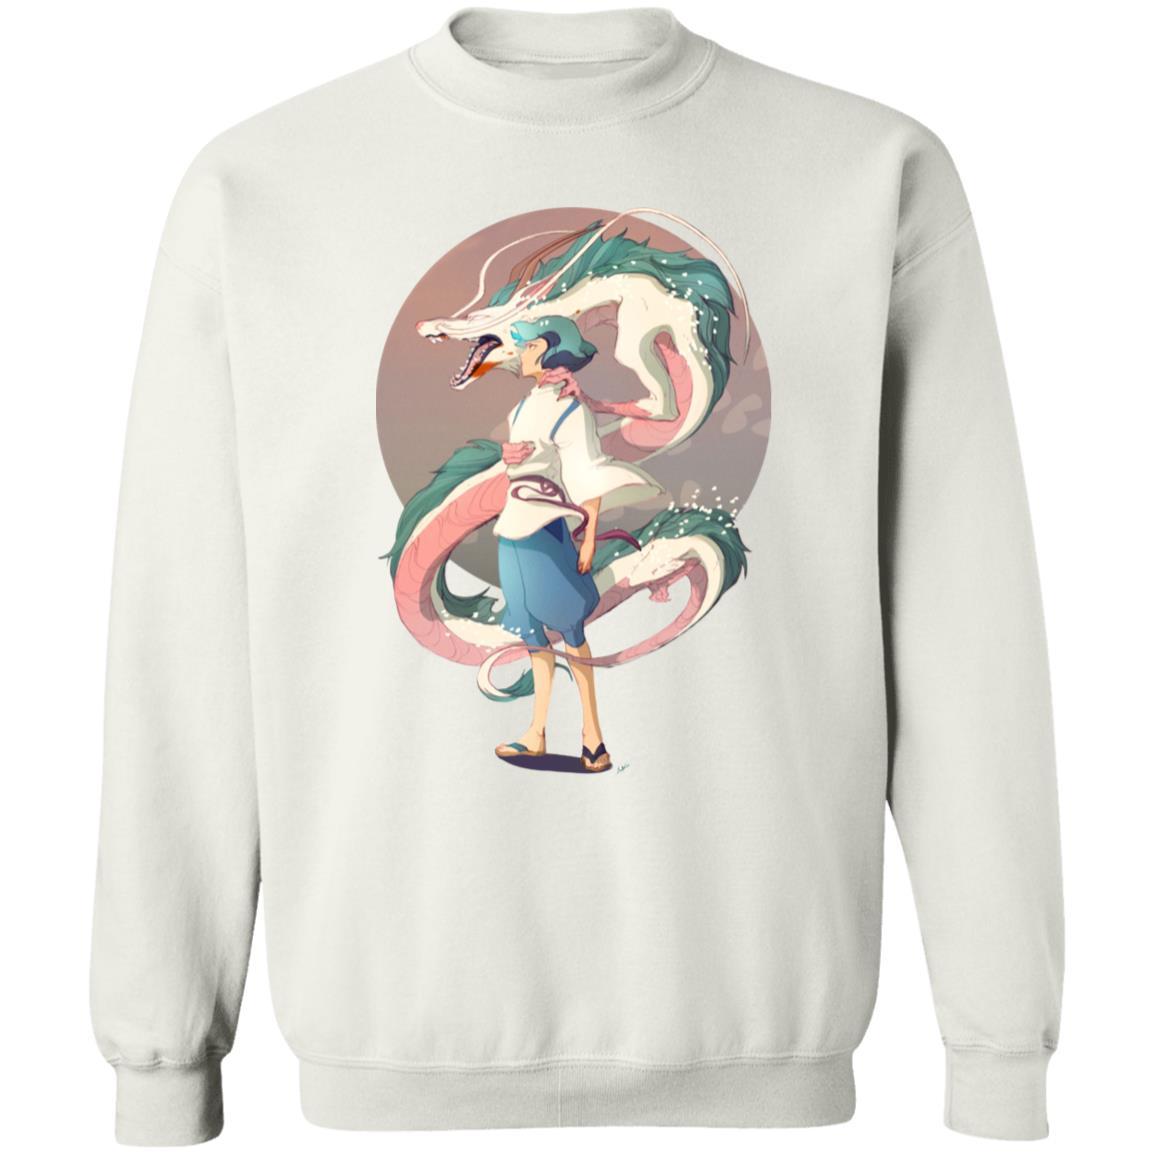 Haku and The Dragon Sweatshirt